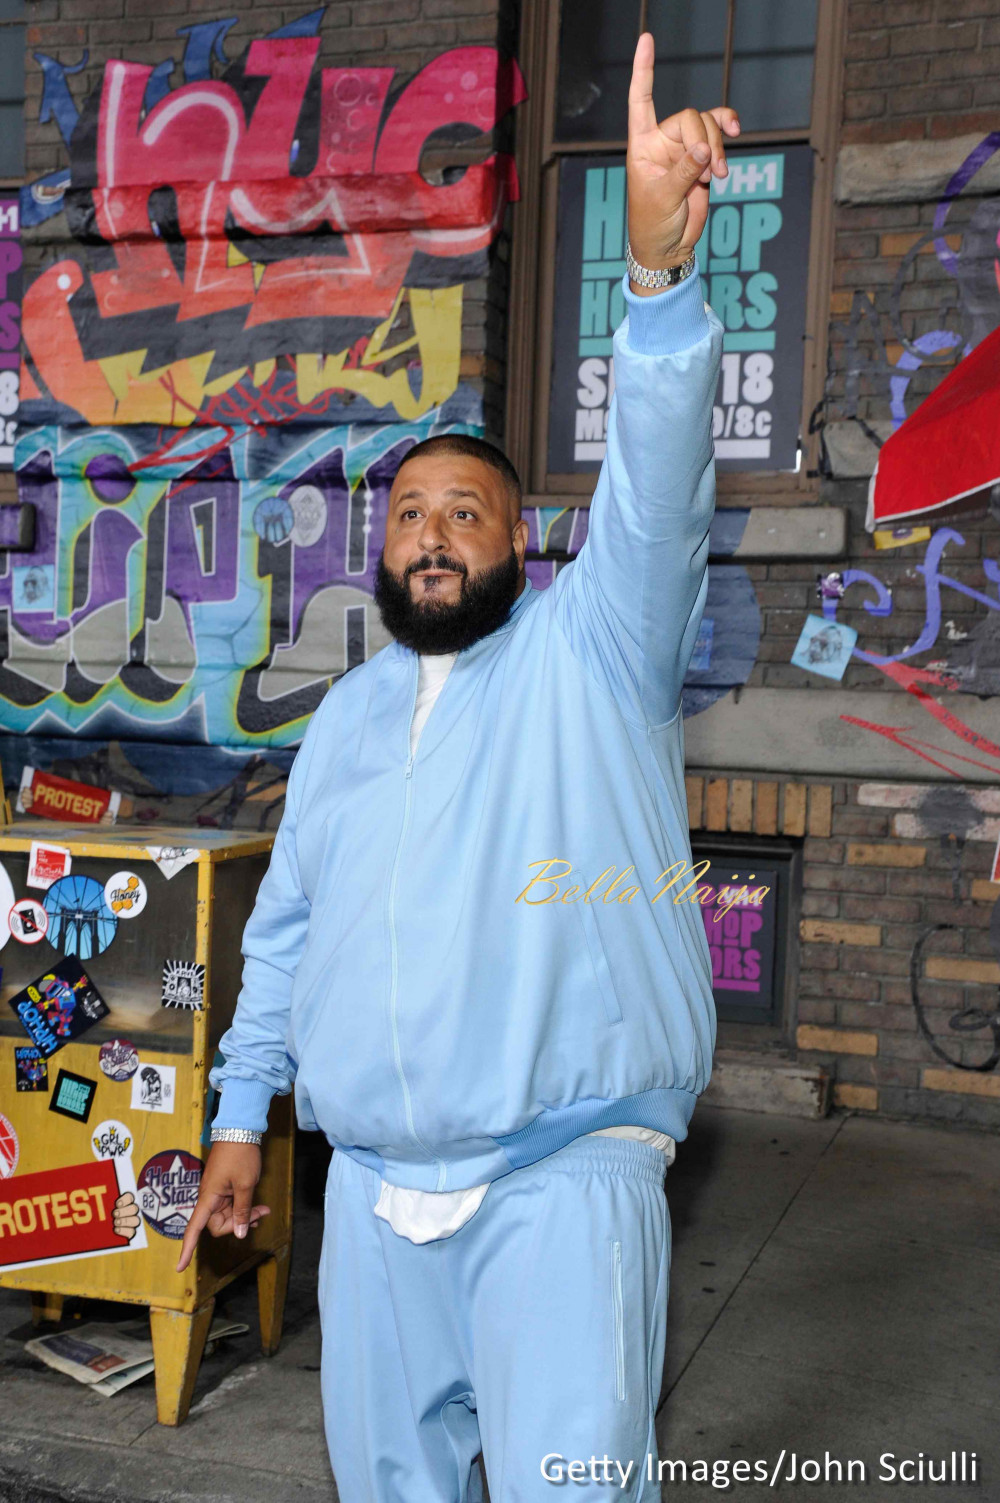 BellaNaija - DJ Khaled & Asahd, Lil Kim, Blac Chyna step out for VH1 Hip Hop Honors: The 90's Game Changers